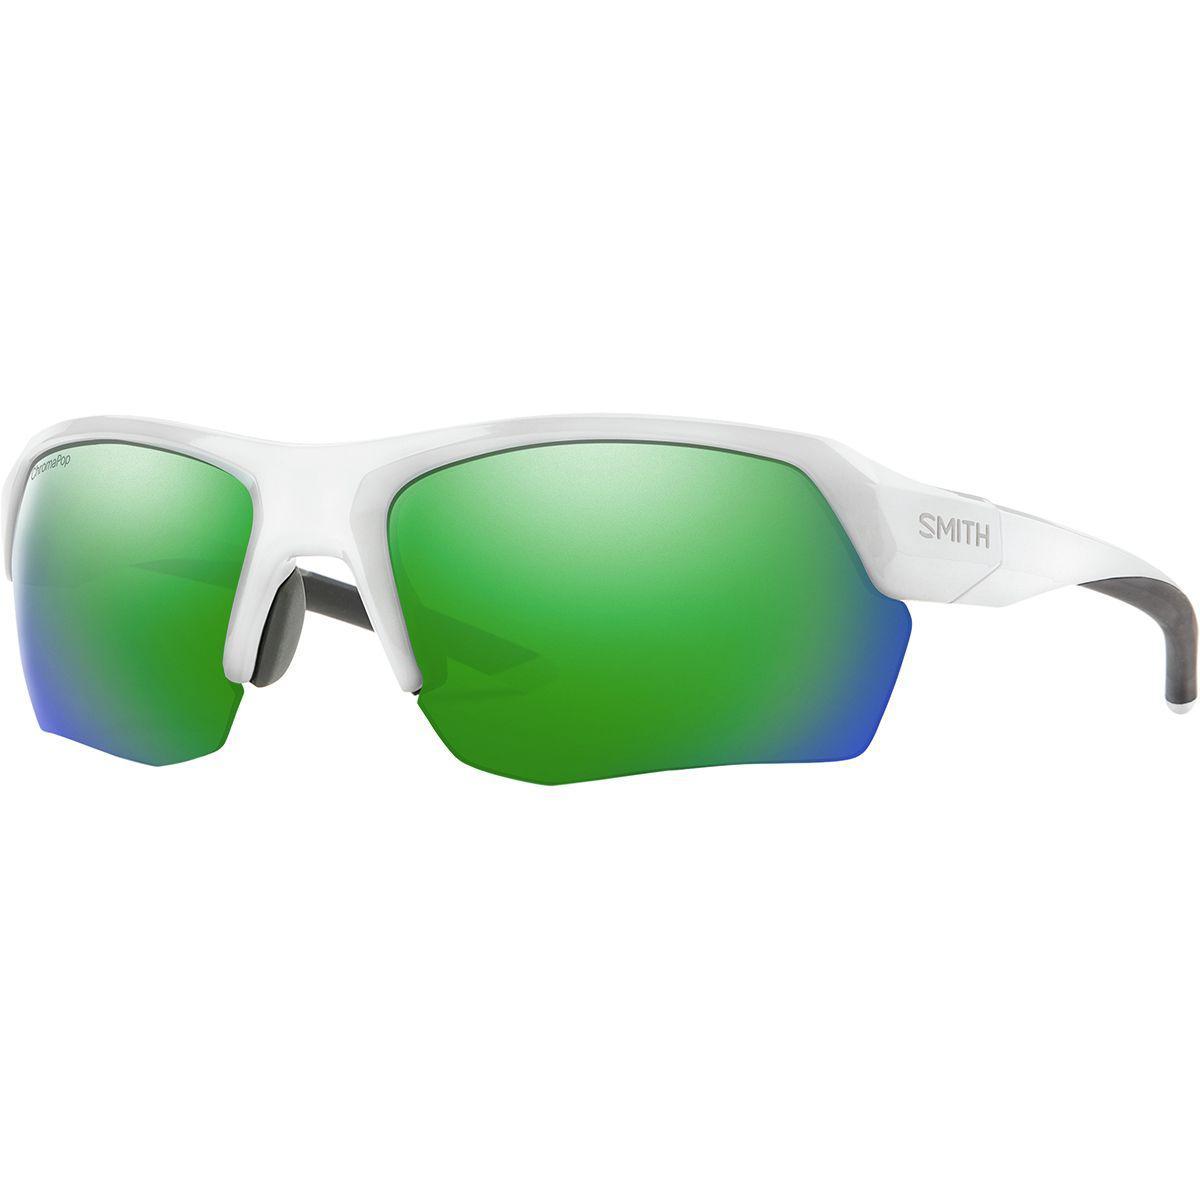 e25578c072 Smith - Green Tempo Max Chromapop Sunglasses for Men - Lyst. View fullscreen